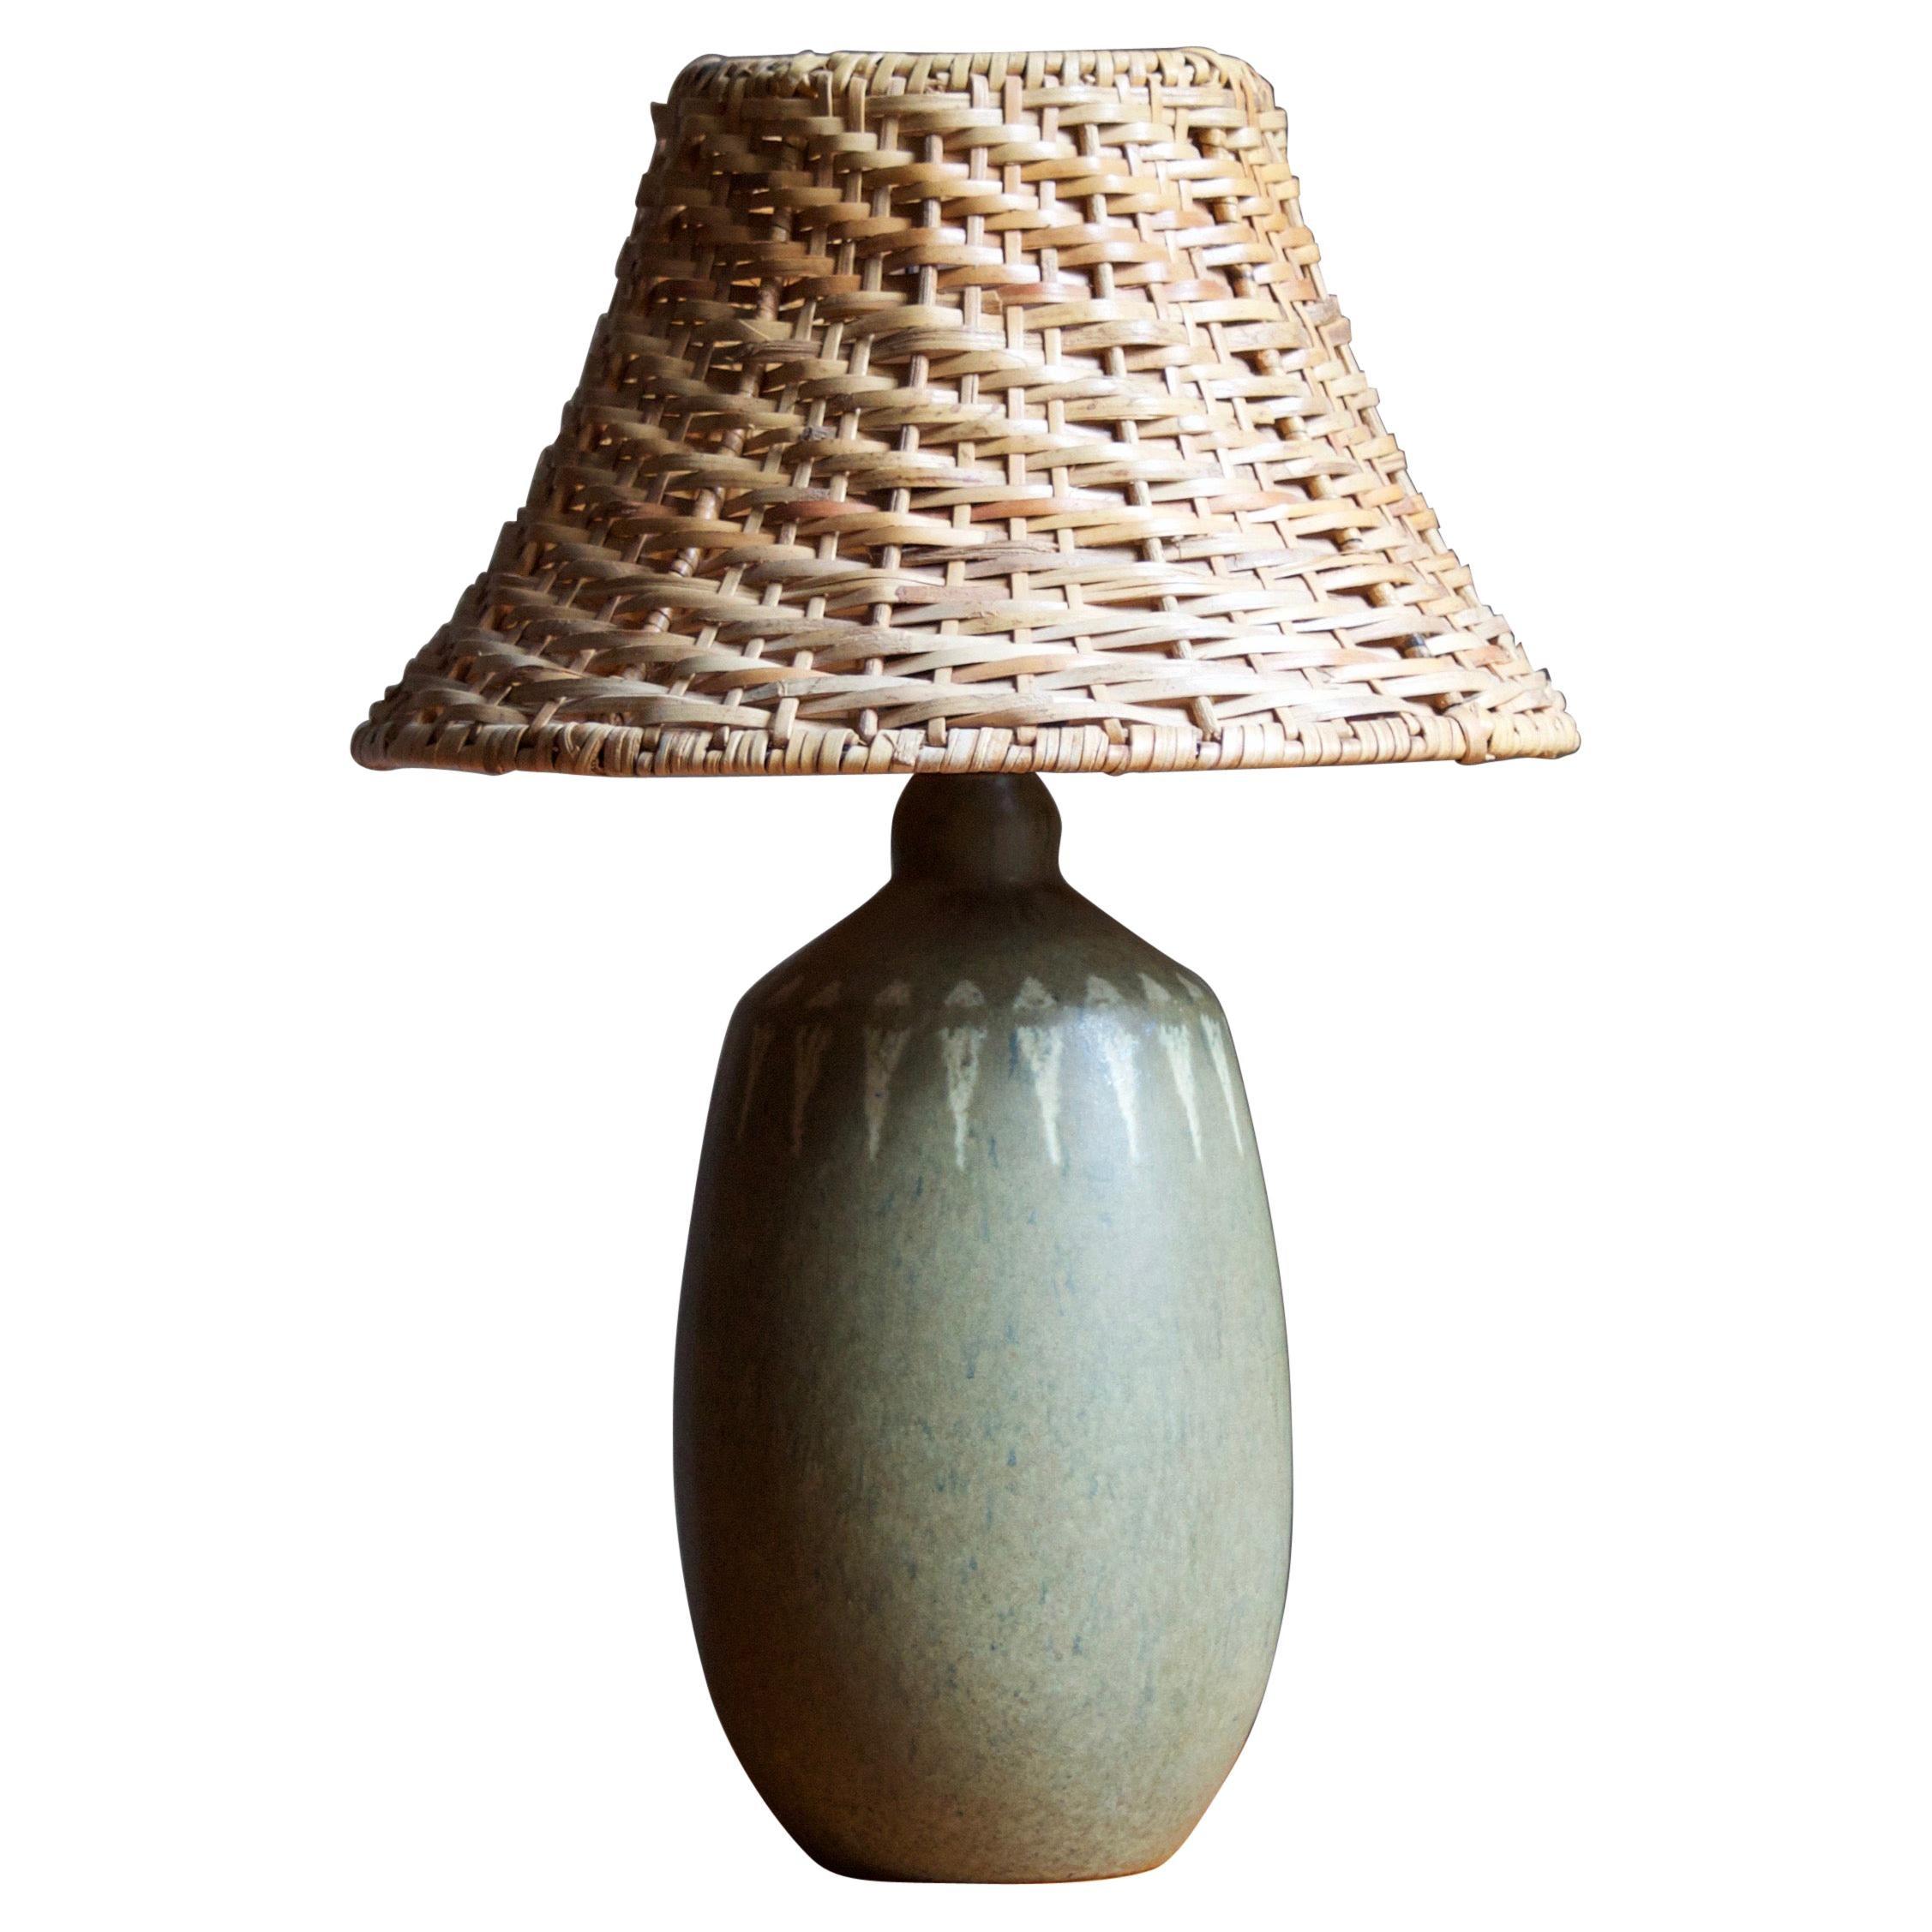 Swedish Designer, Table Lamp, Stoneware, Rattan, Sweden, 1960s